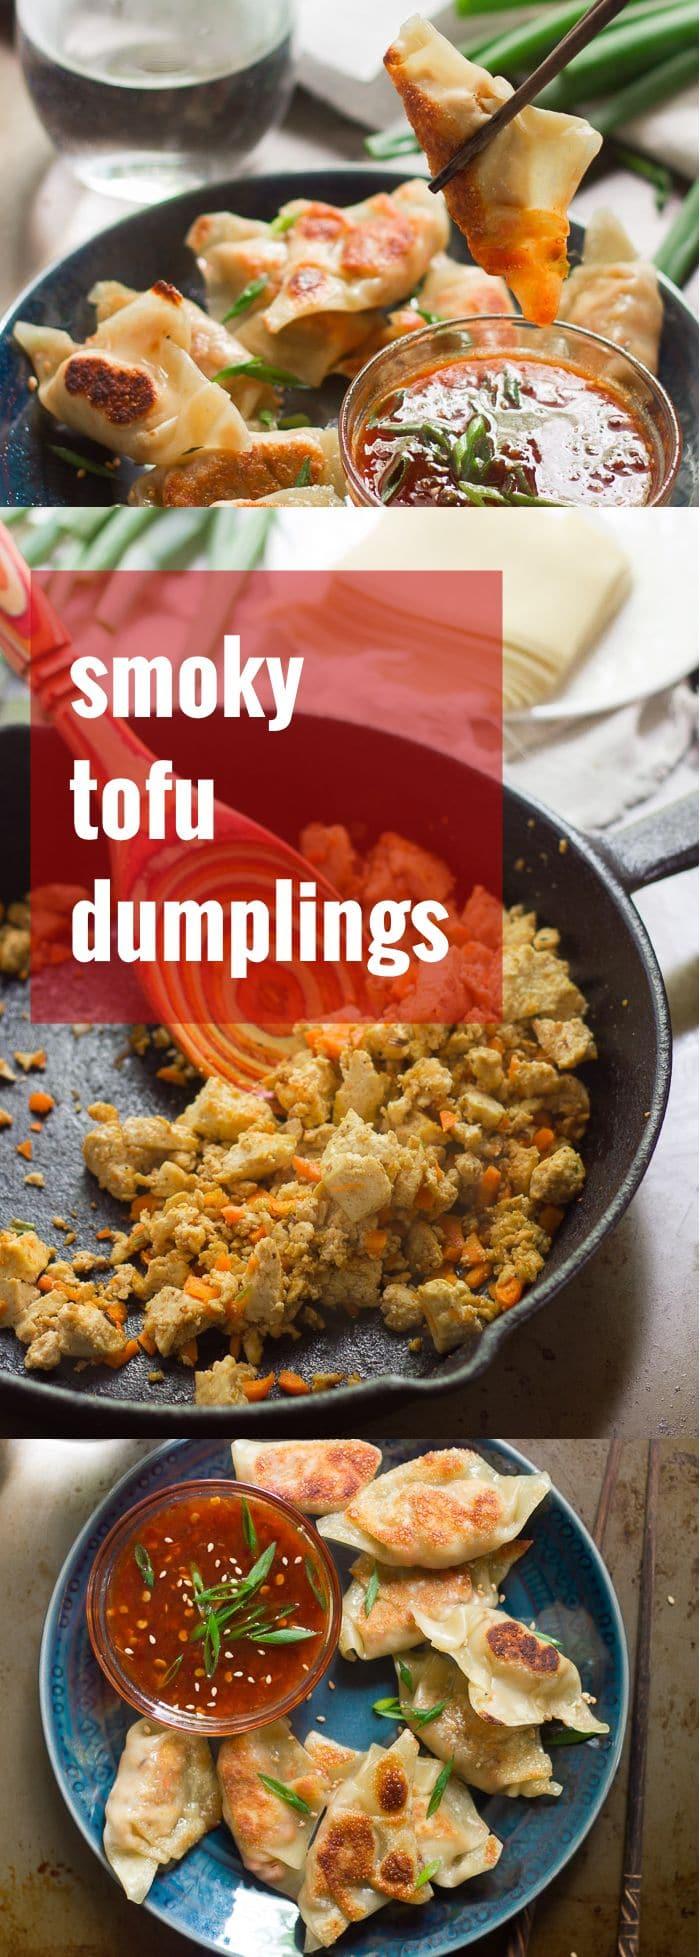 Smoky Tofu Dumplings with Sweet Chili Dipping Sauce